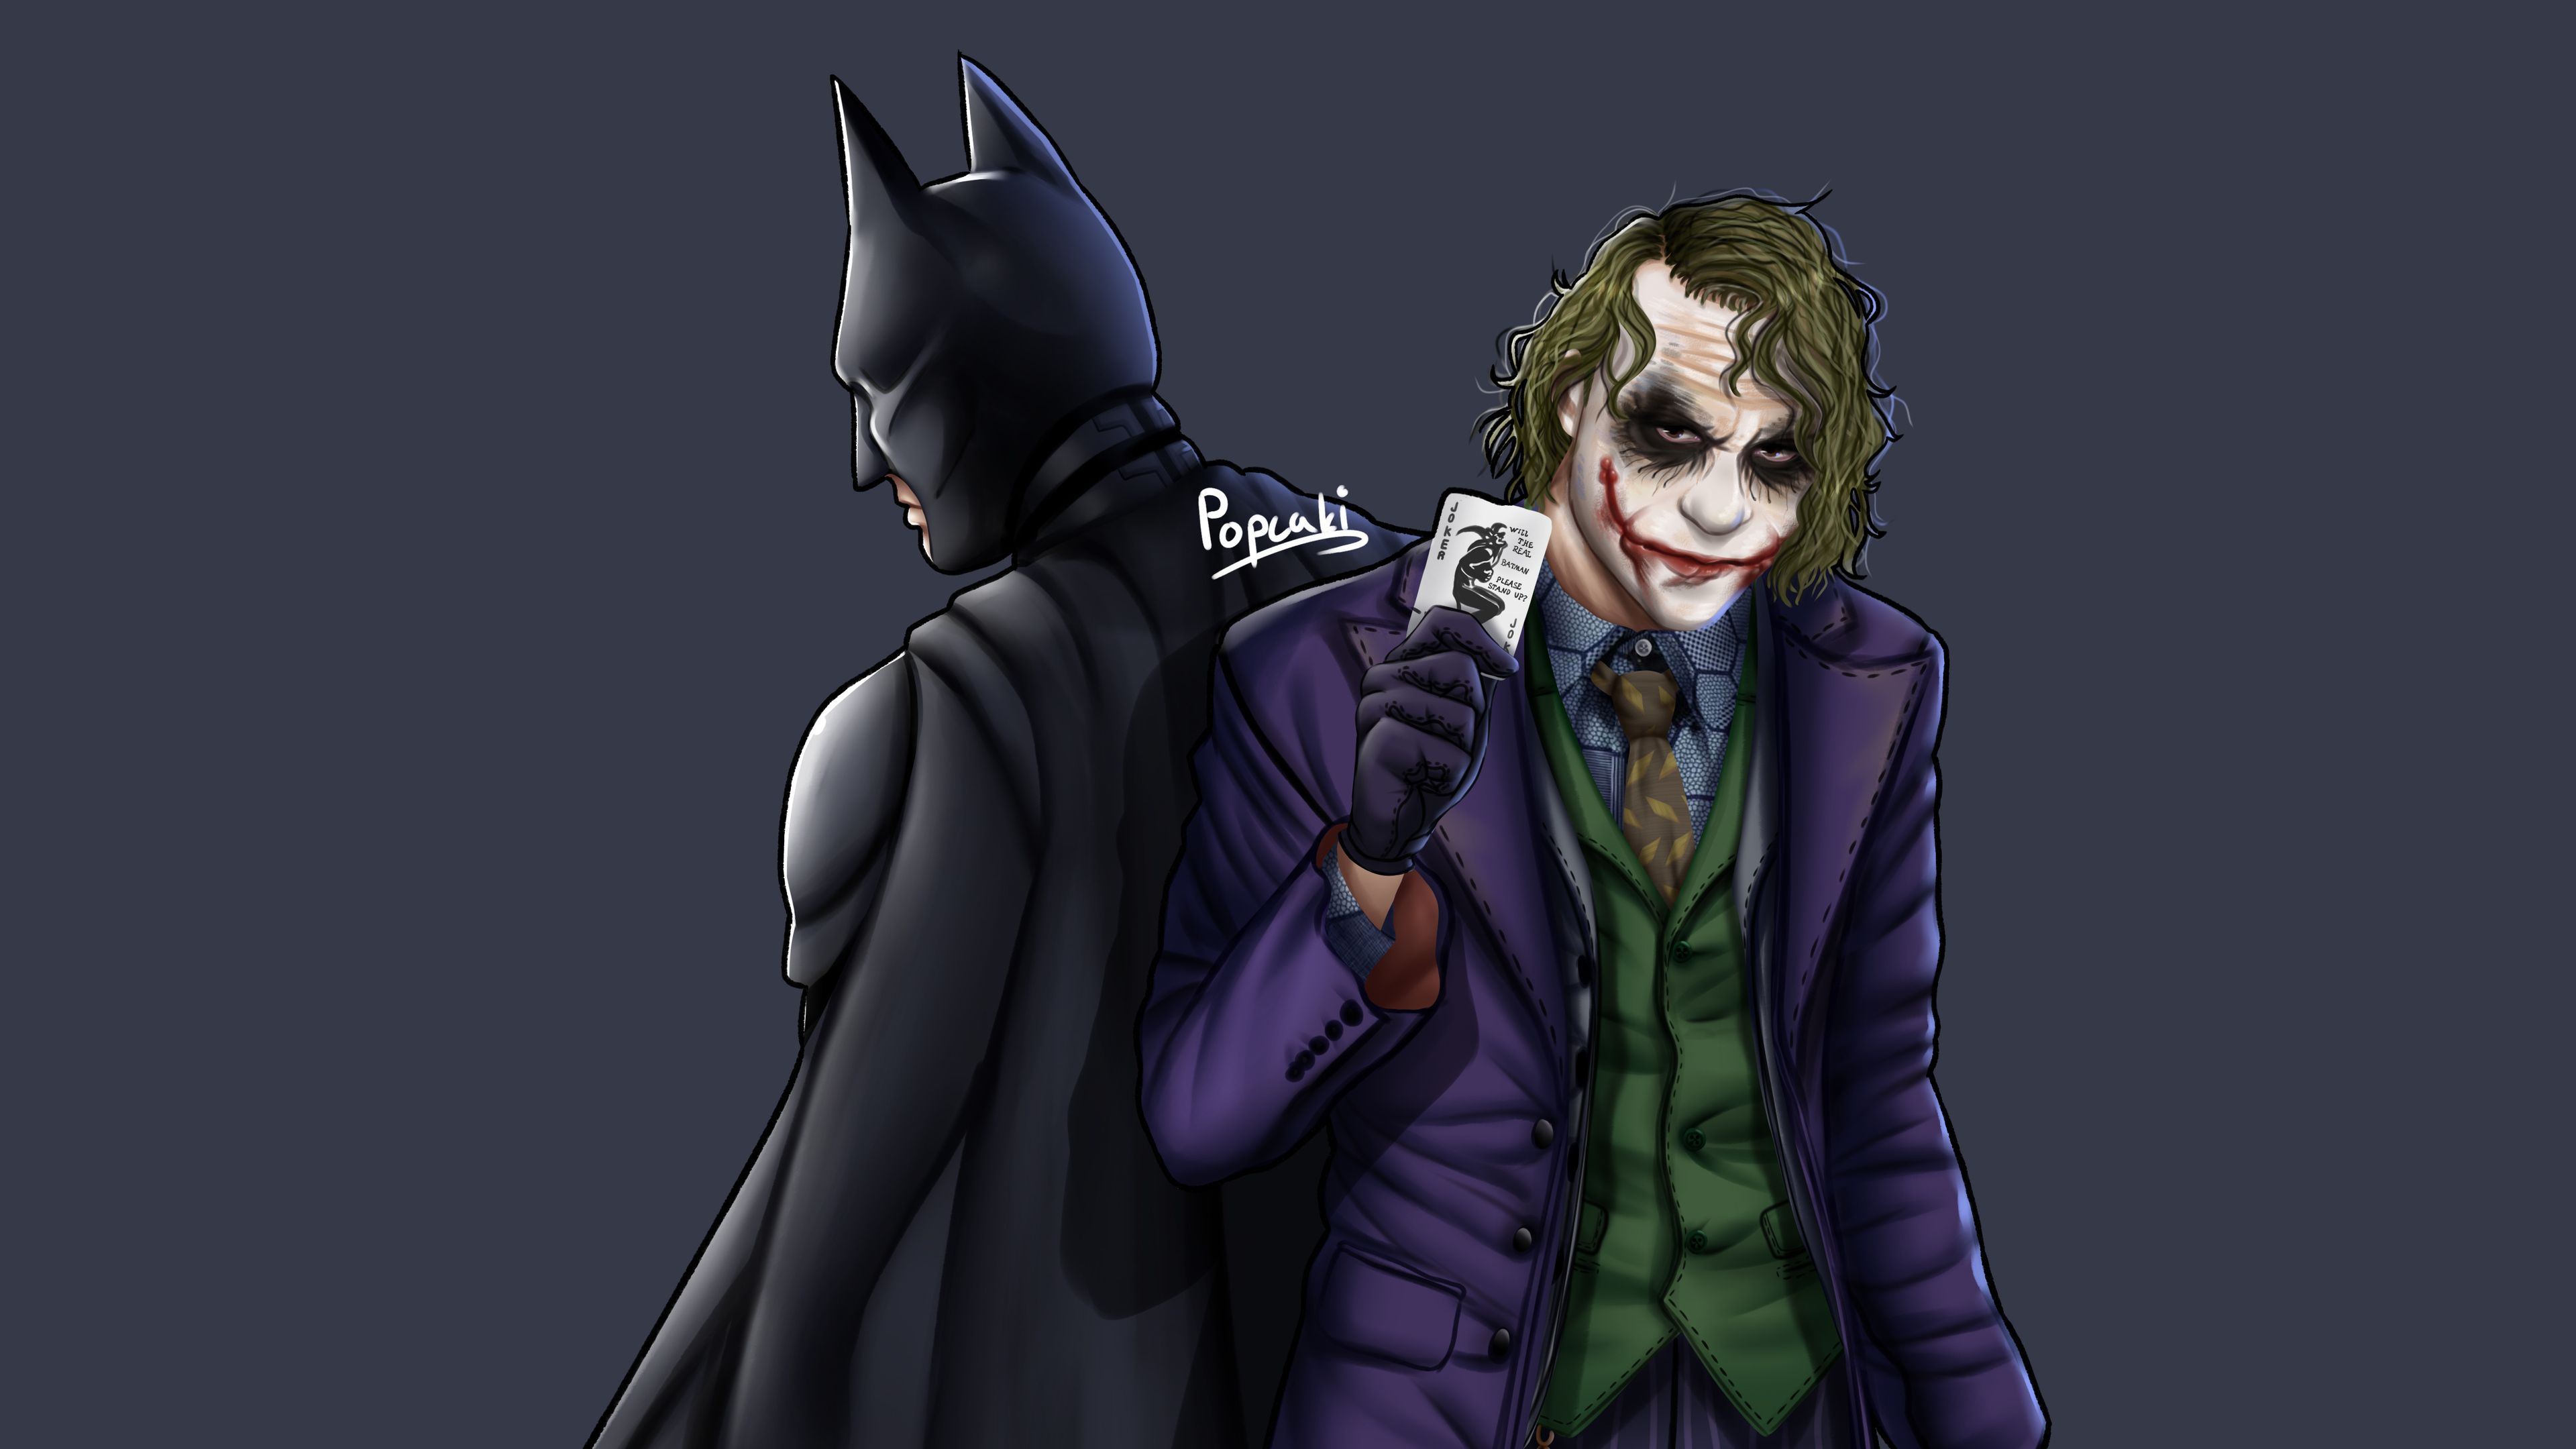 Joker Batman Art 4k Superheroes Wallpapers Joker Wallpapers Hd Wallpapers Digital Art Wallpapers Batman Wallpa Batman Wallpaper Joker Wallpapers Batman Art Batman joker joker wallpaper 4k for